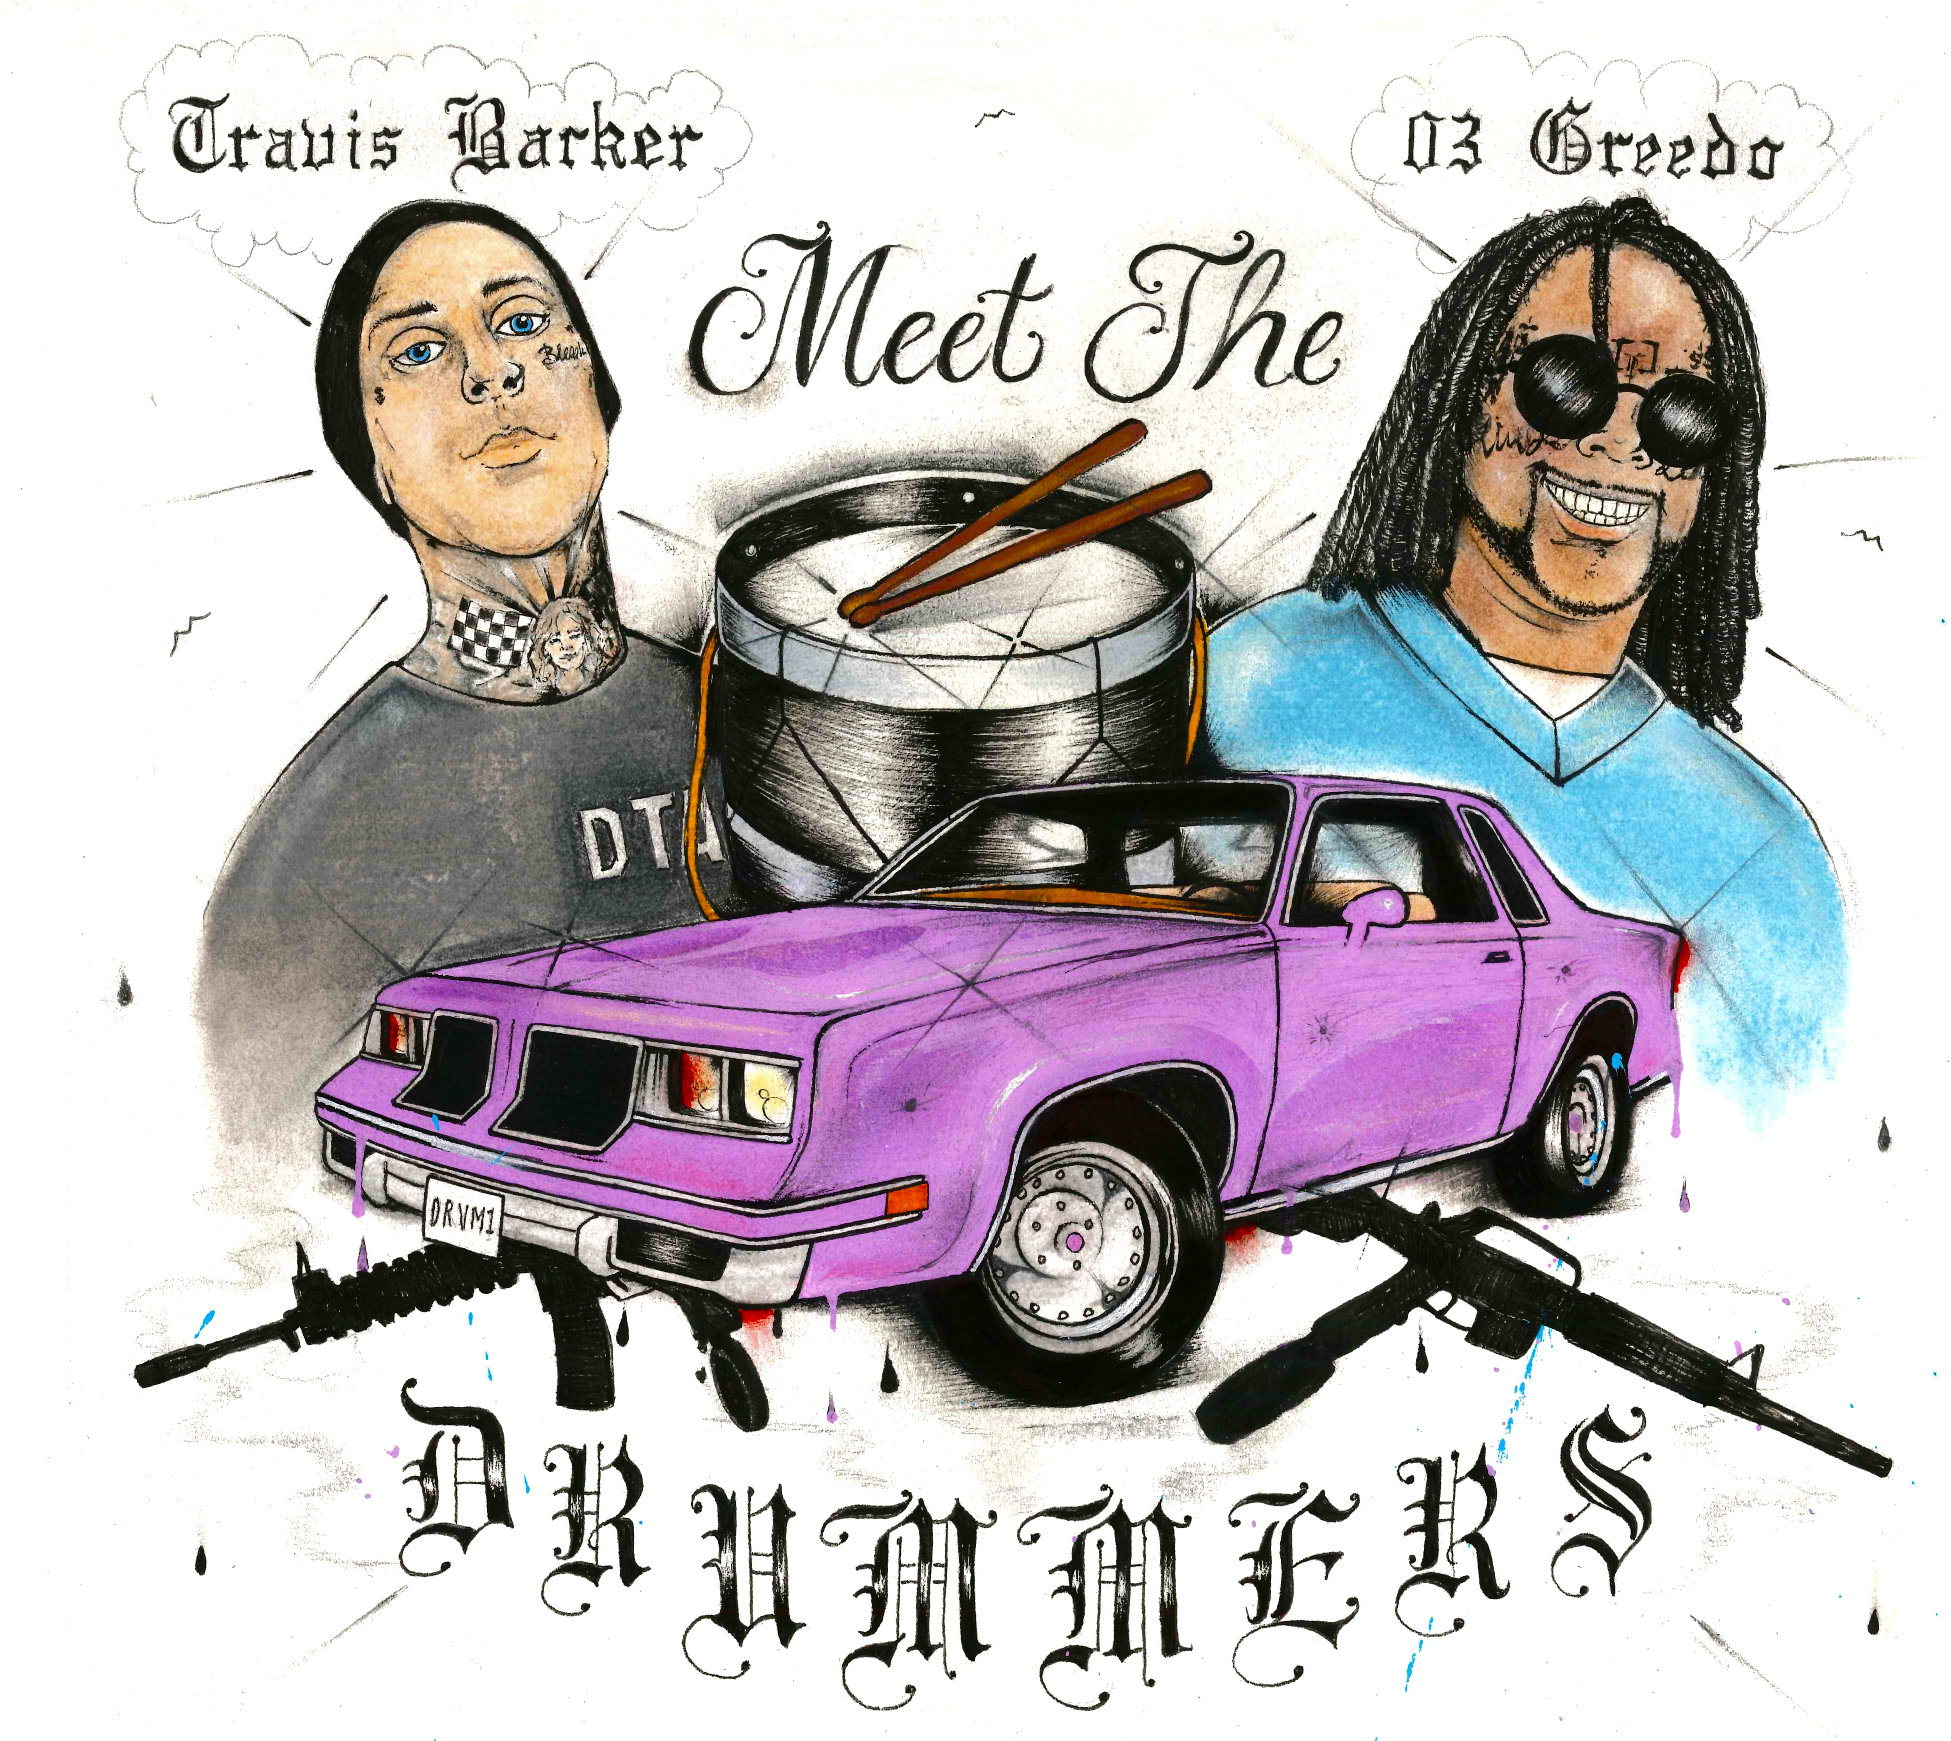 Worlds Collide: 03 Greedo & Travis Barker Share 'Meet The Drummers' EP